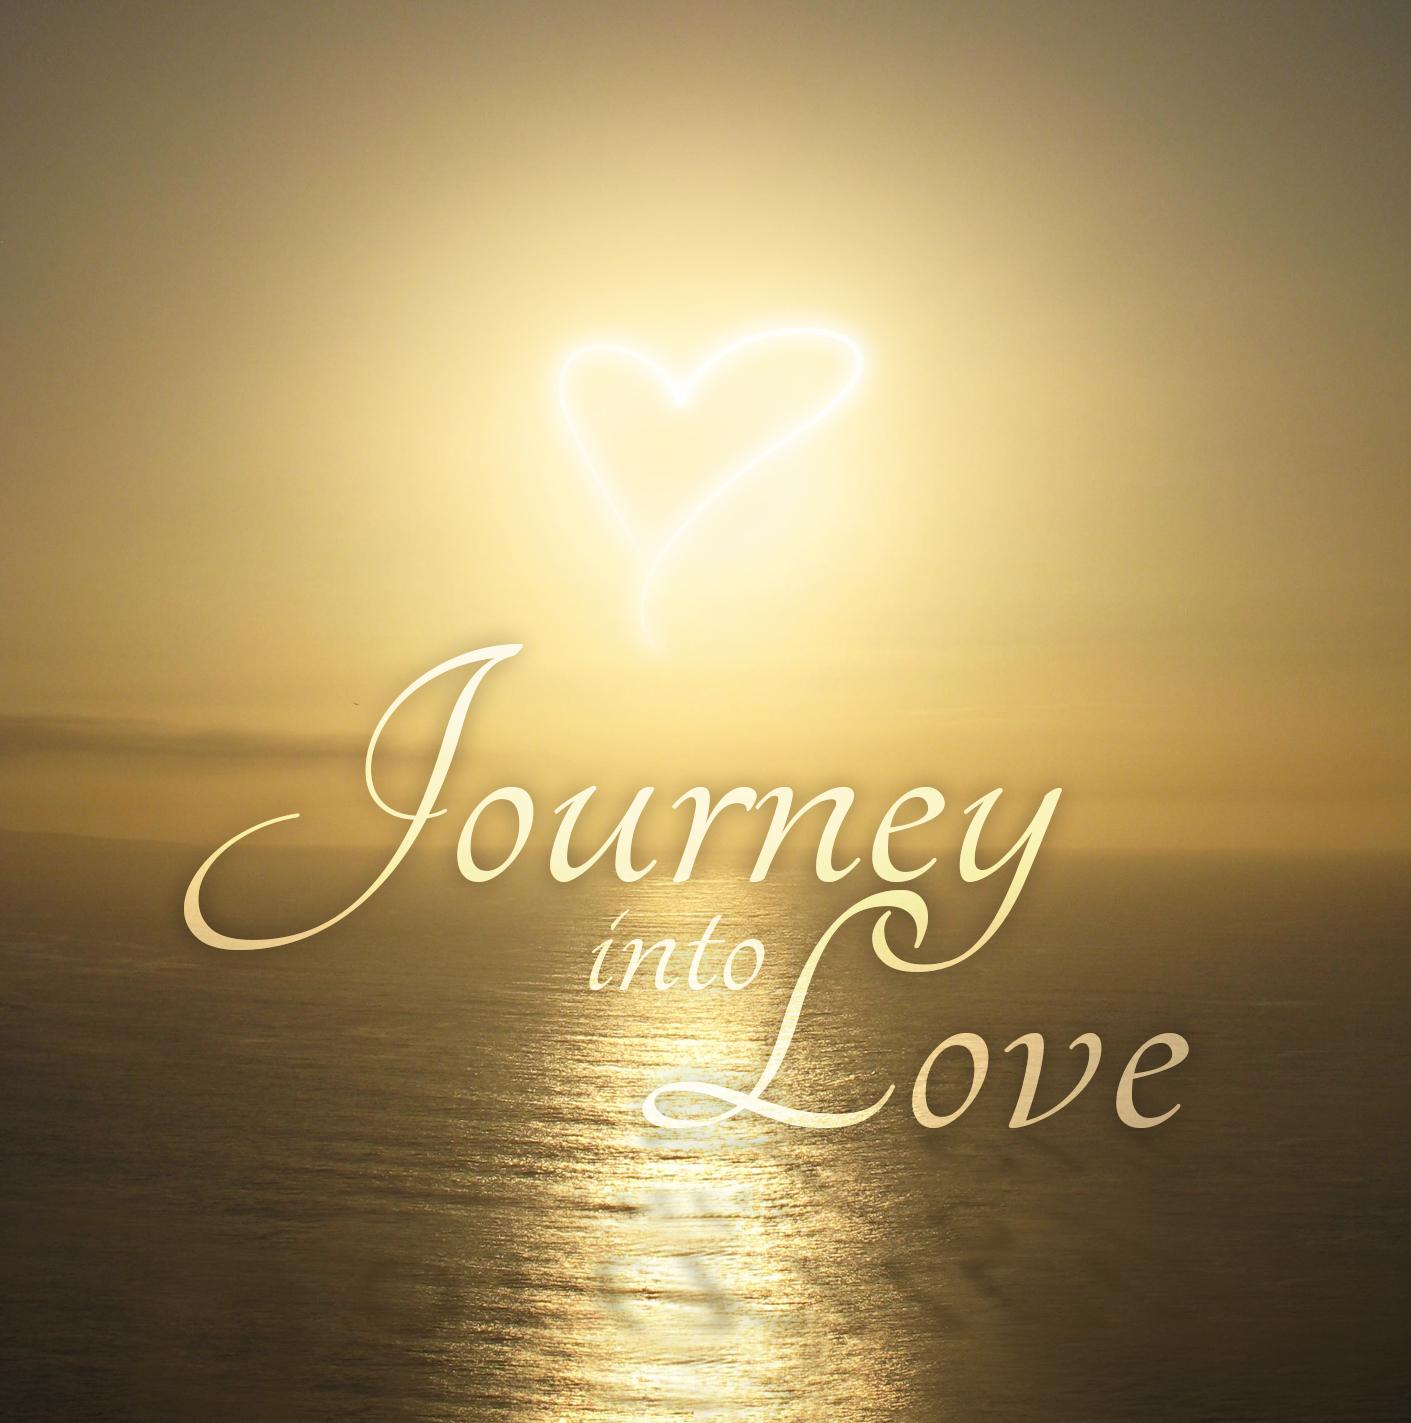 Lyrica - Journey Into Love